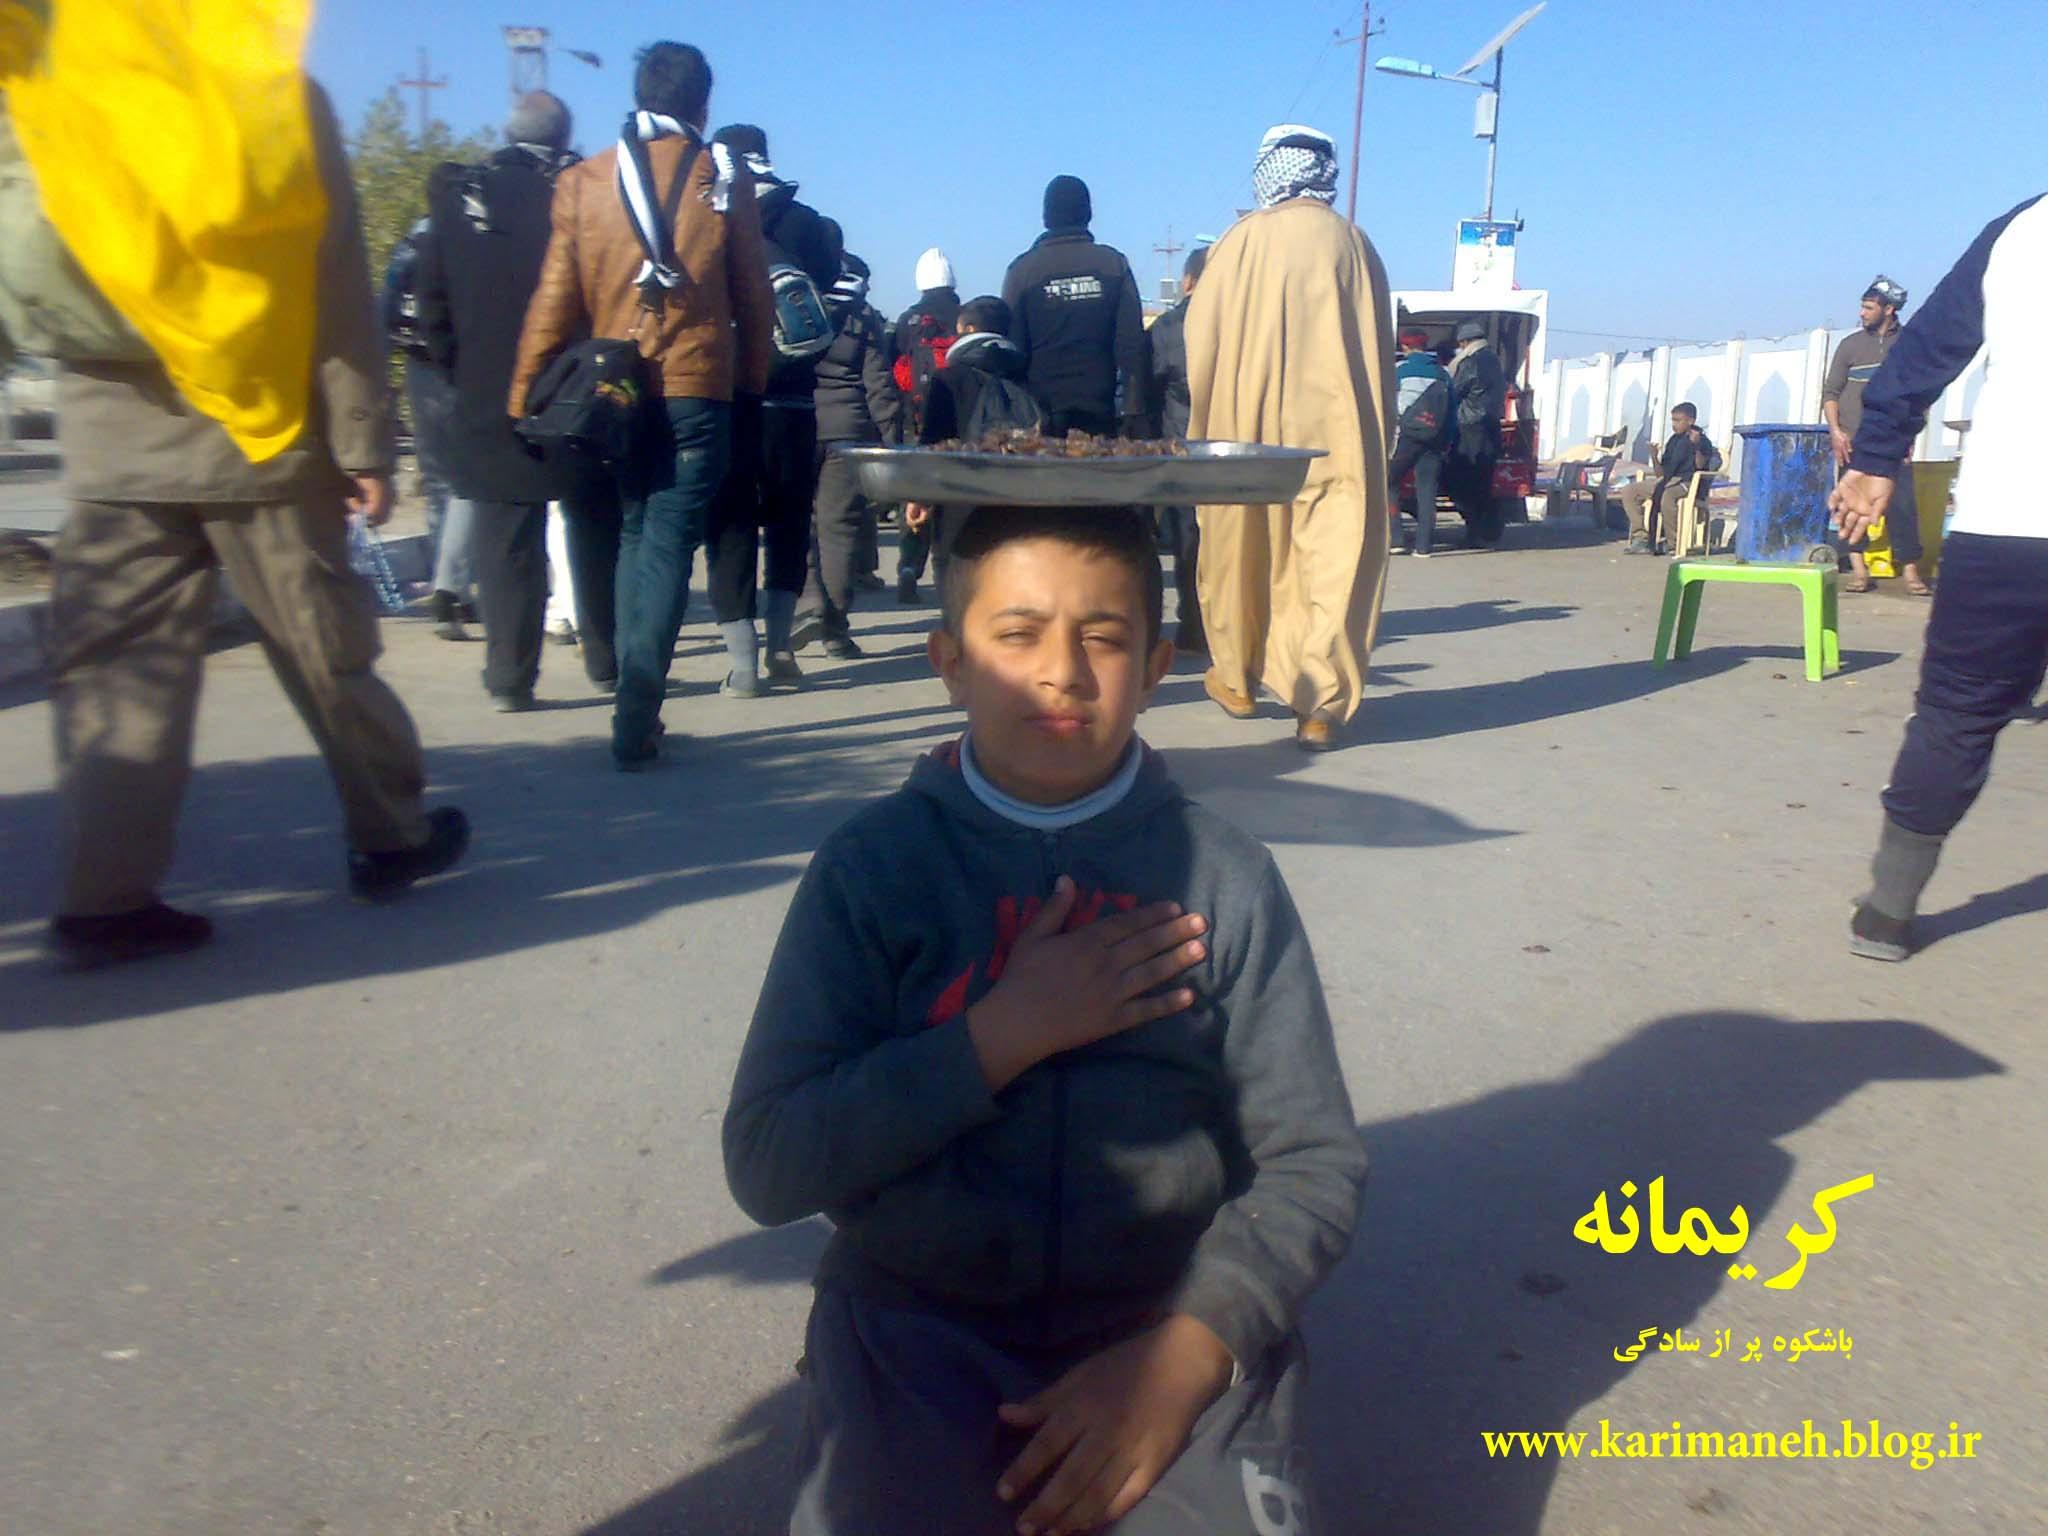 Image result for صحنه های جالب زائرین حسینی امسال عکس کربلا